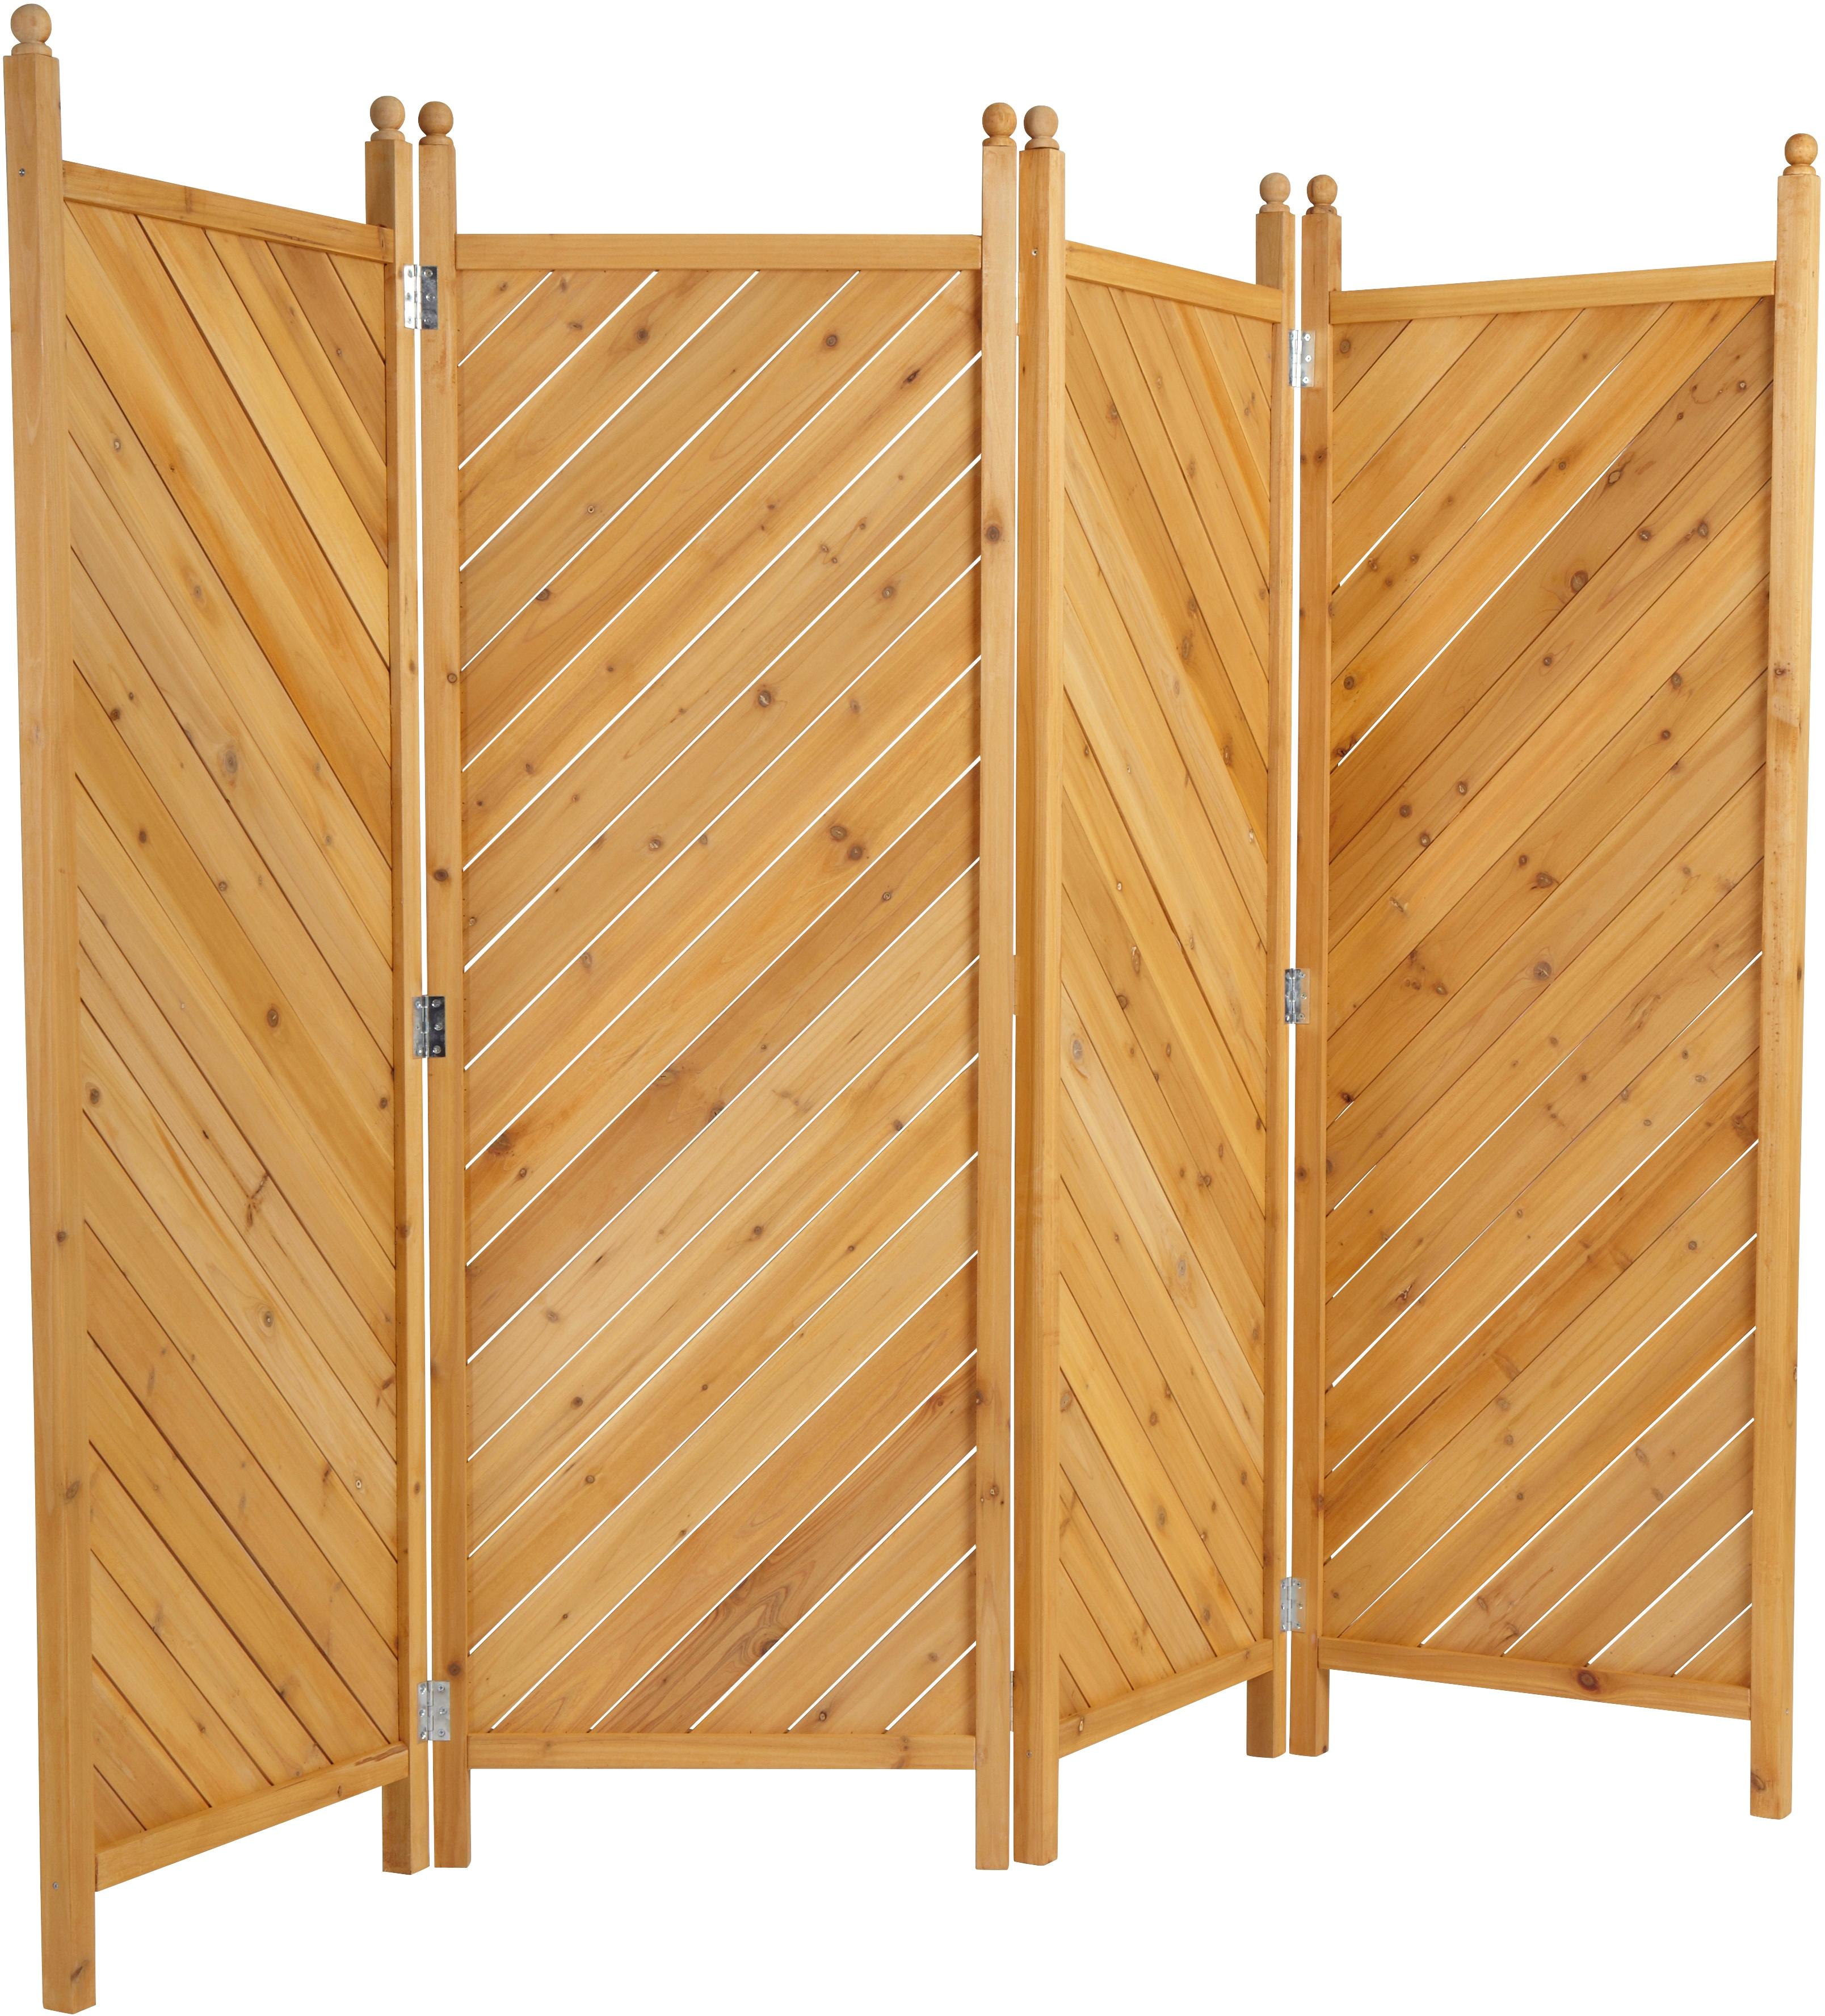 paravent m nchen b h ca 240x180 cm auf rechnung. Black Bedroom Furniture Sets. Home Design Ideas